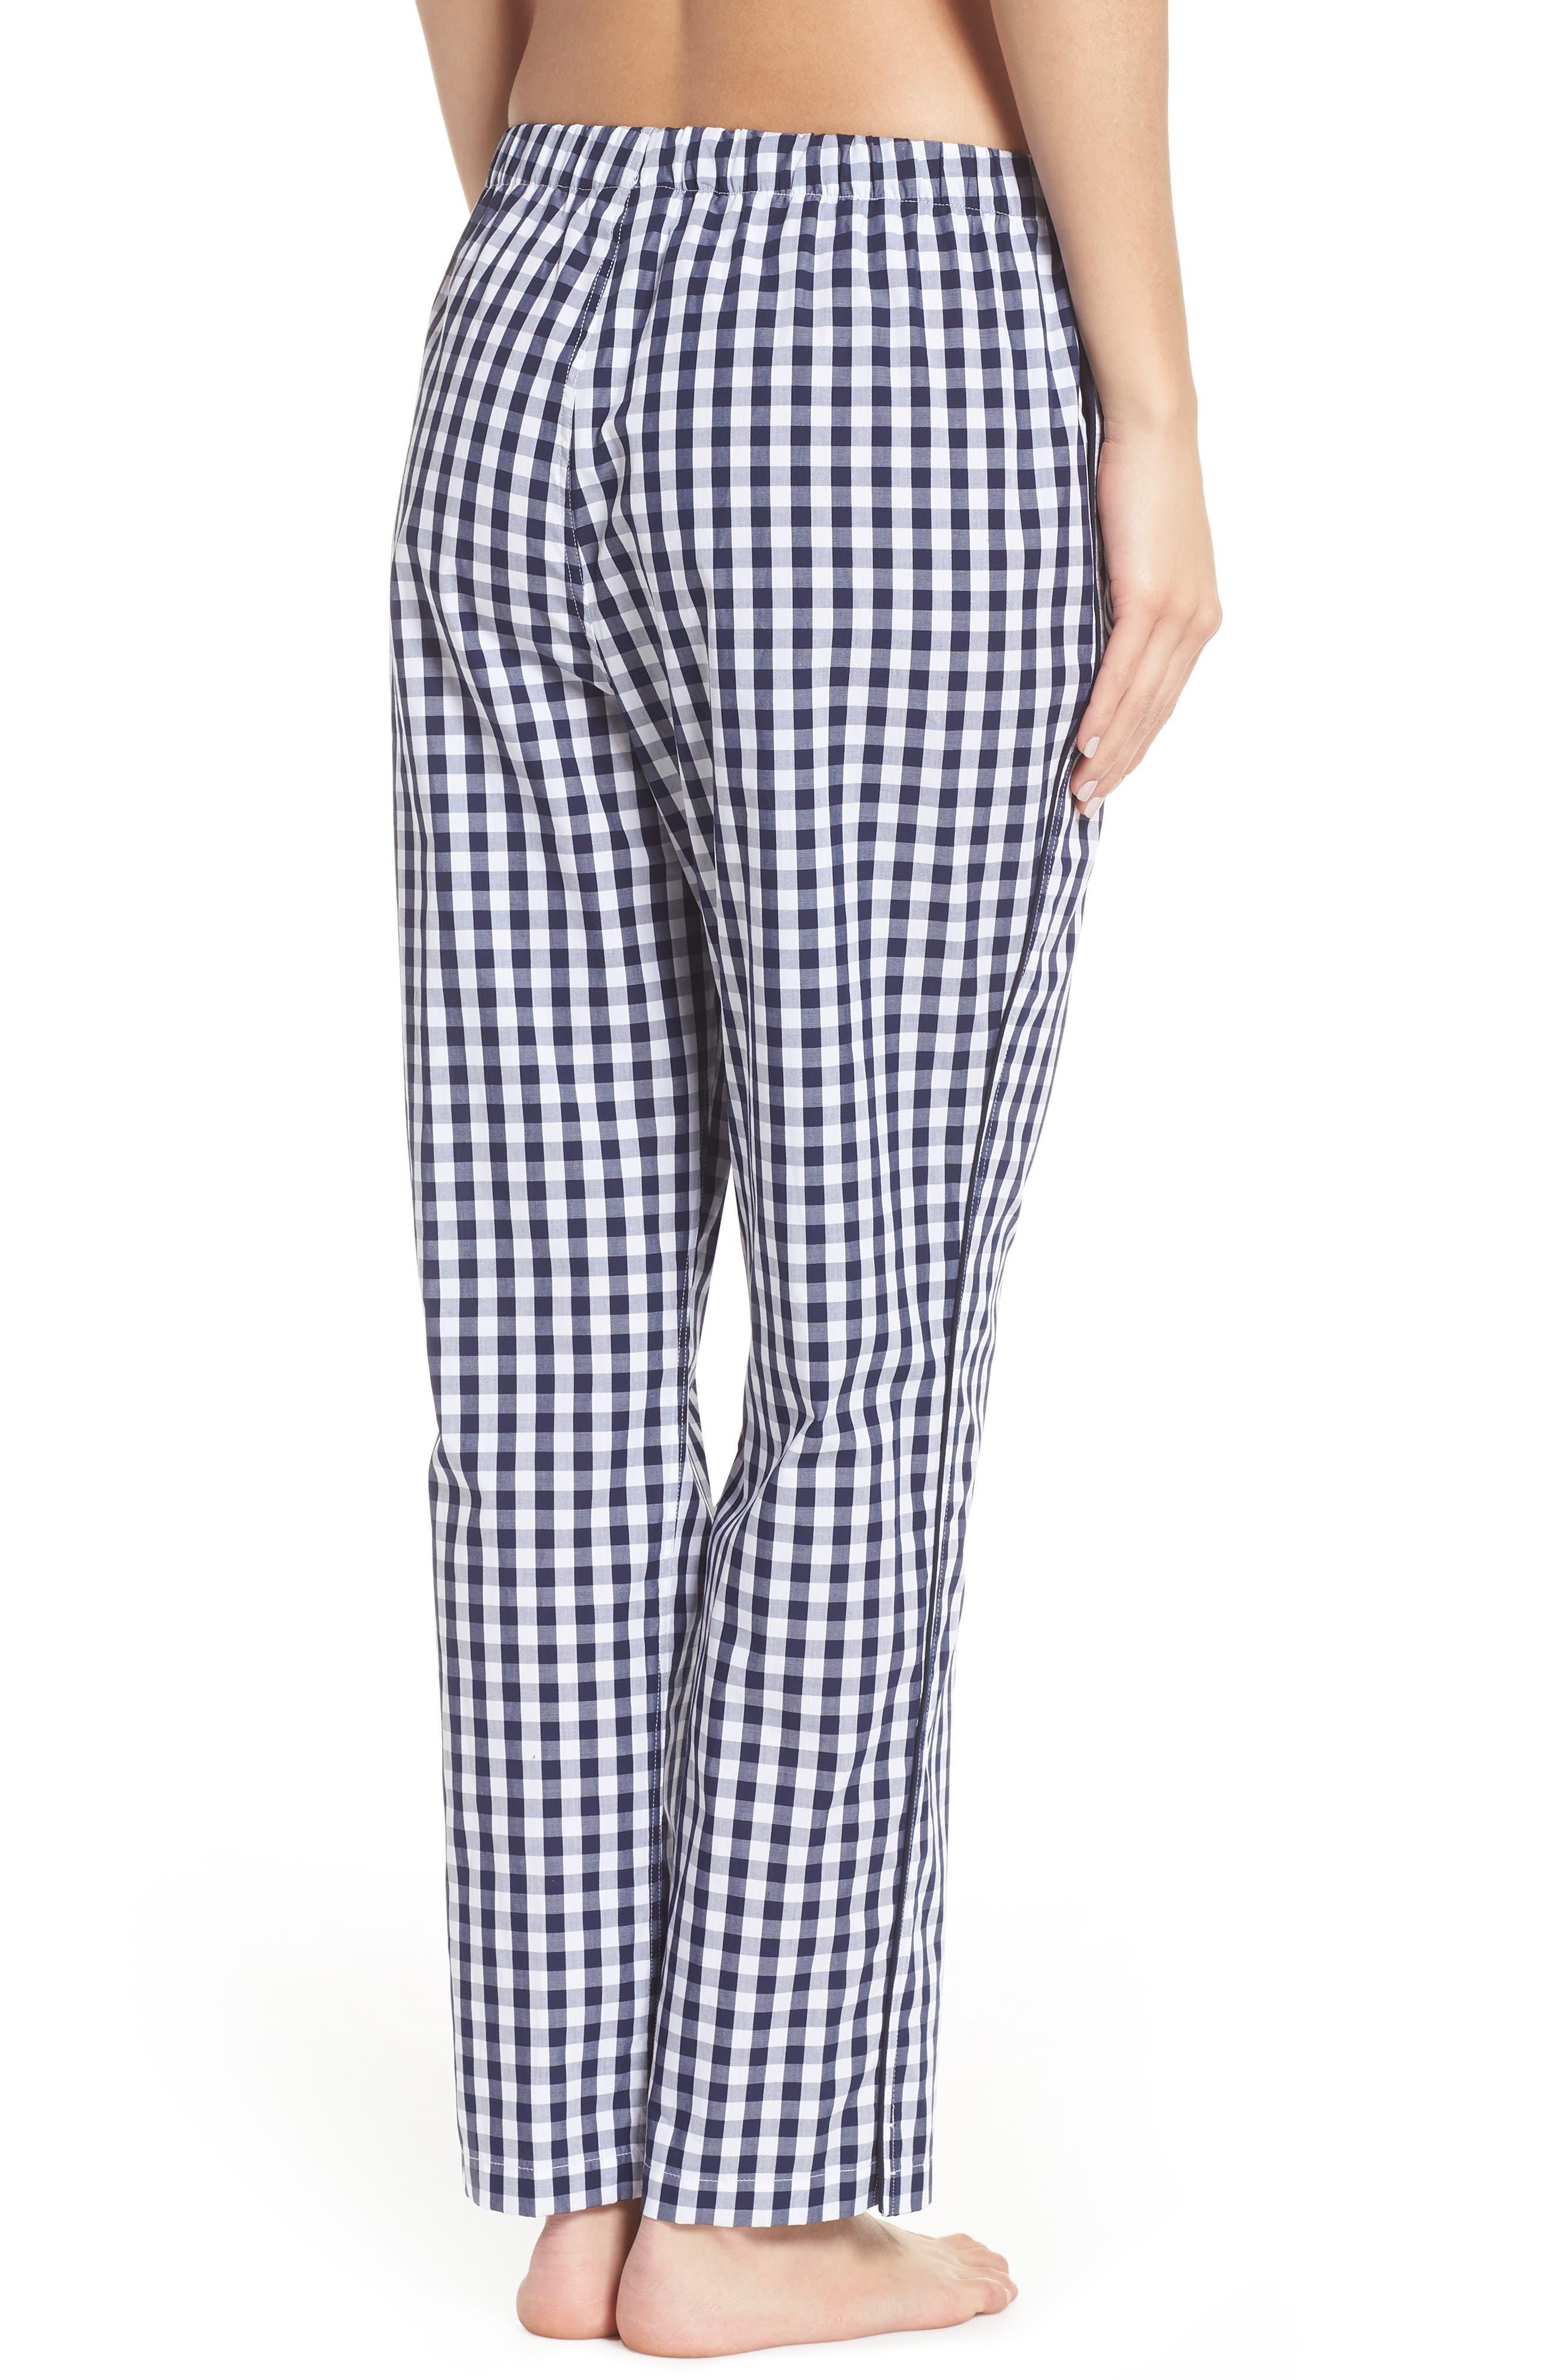 Marina Women's Pajama Pants,                             Alternate thumbnail 3, color,                             LARGE GINGHAM BLUE